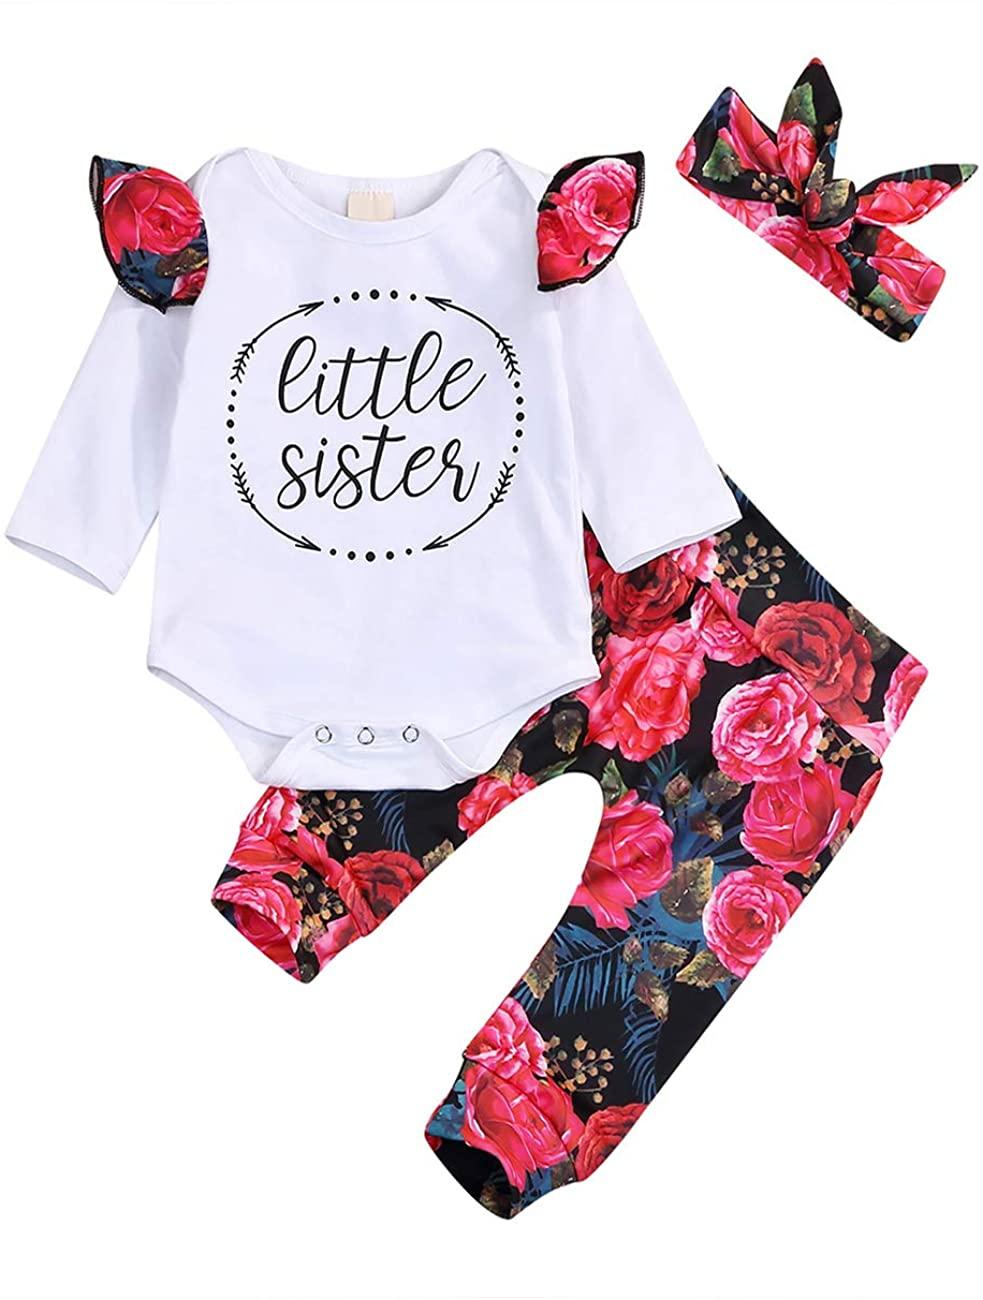 Newborn Baby Girl Outfit Little Sister Print Romper + Flower Pants + Hat + Bows Headband 3pcs Clothes Set